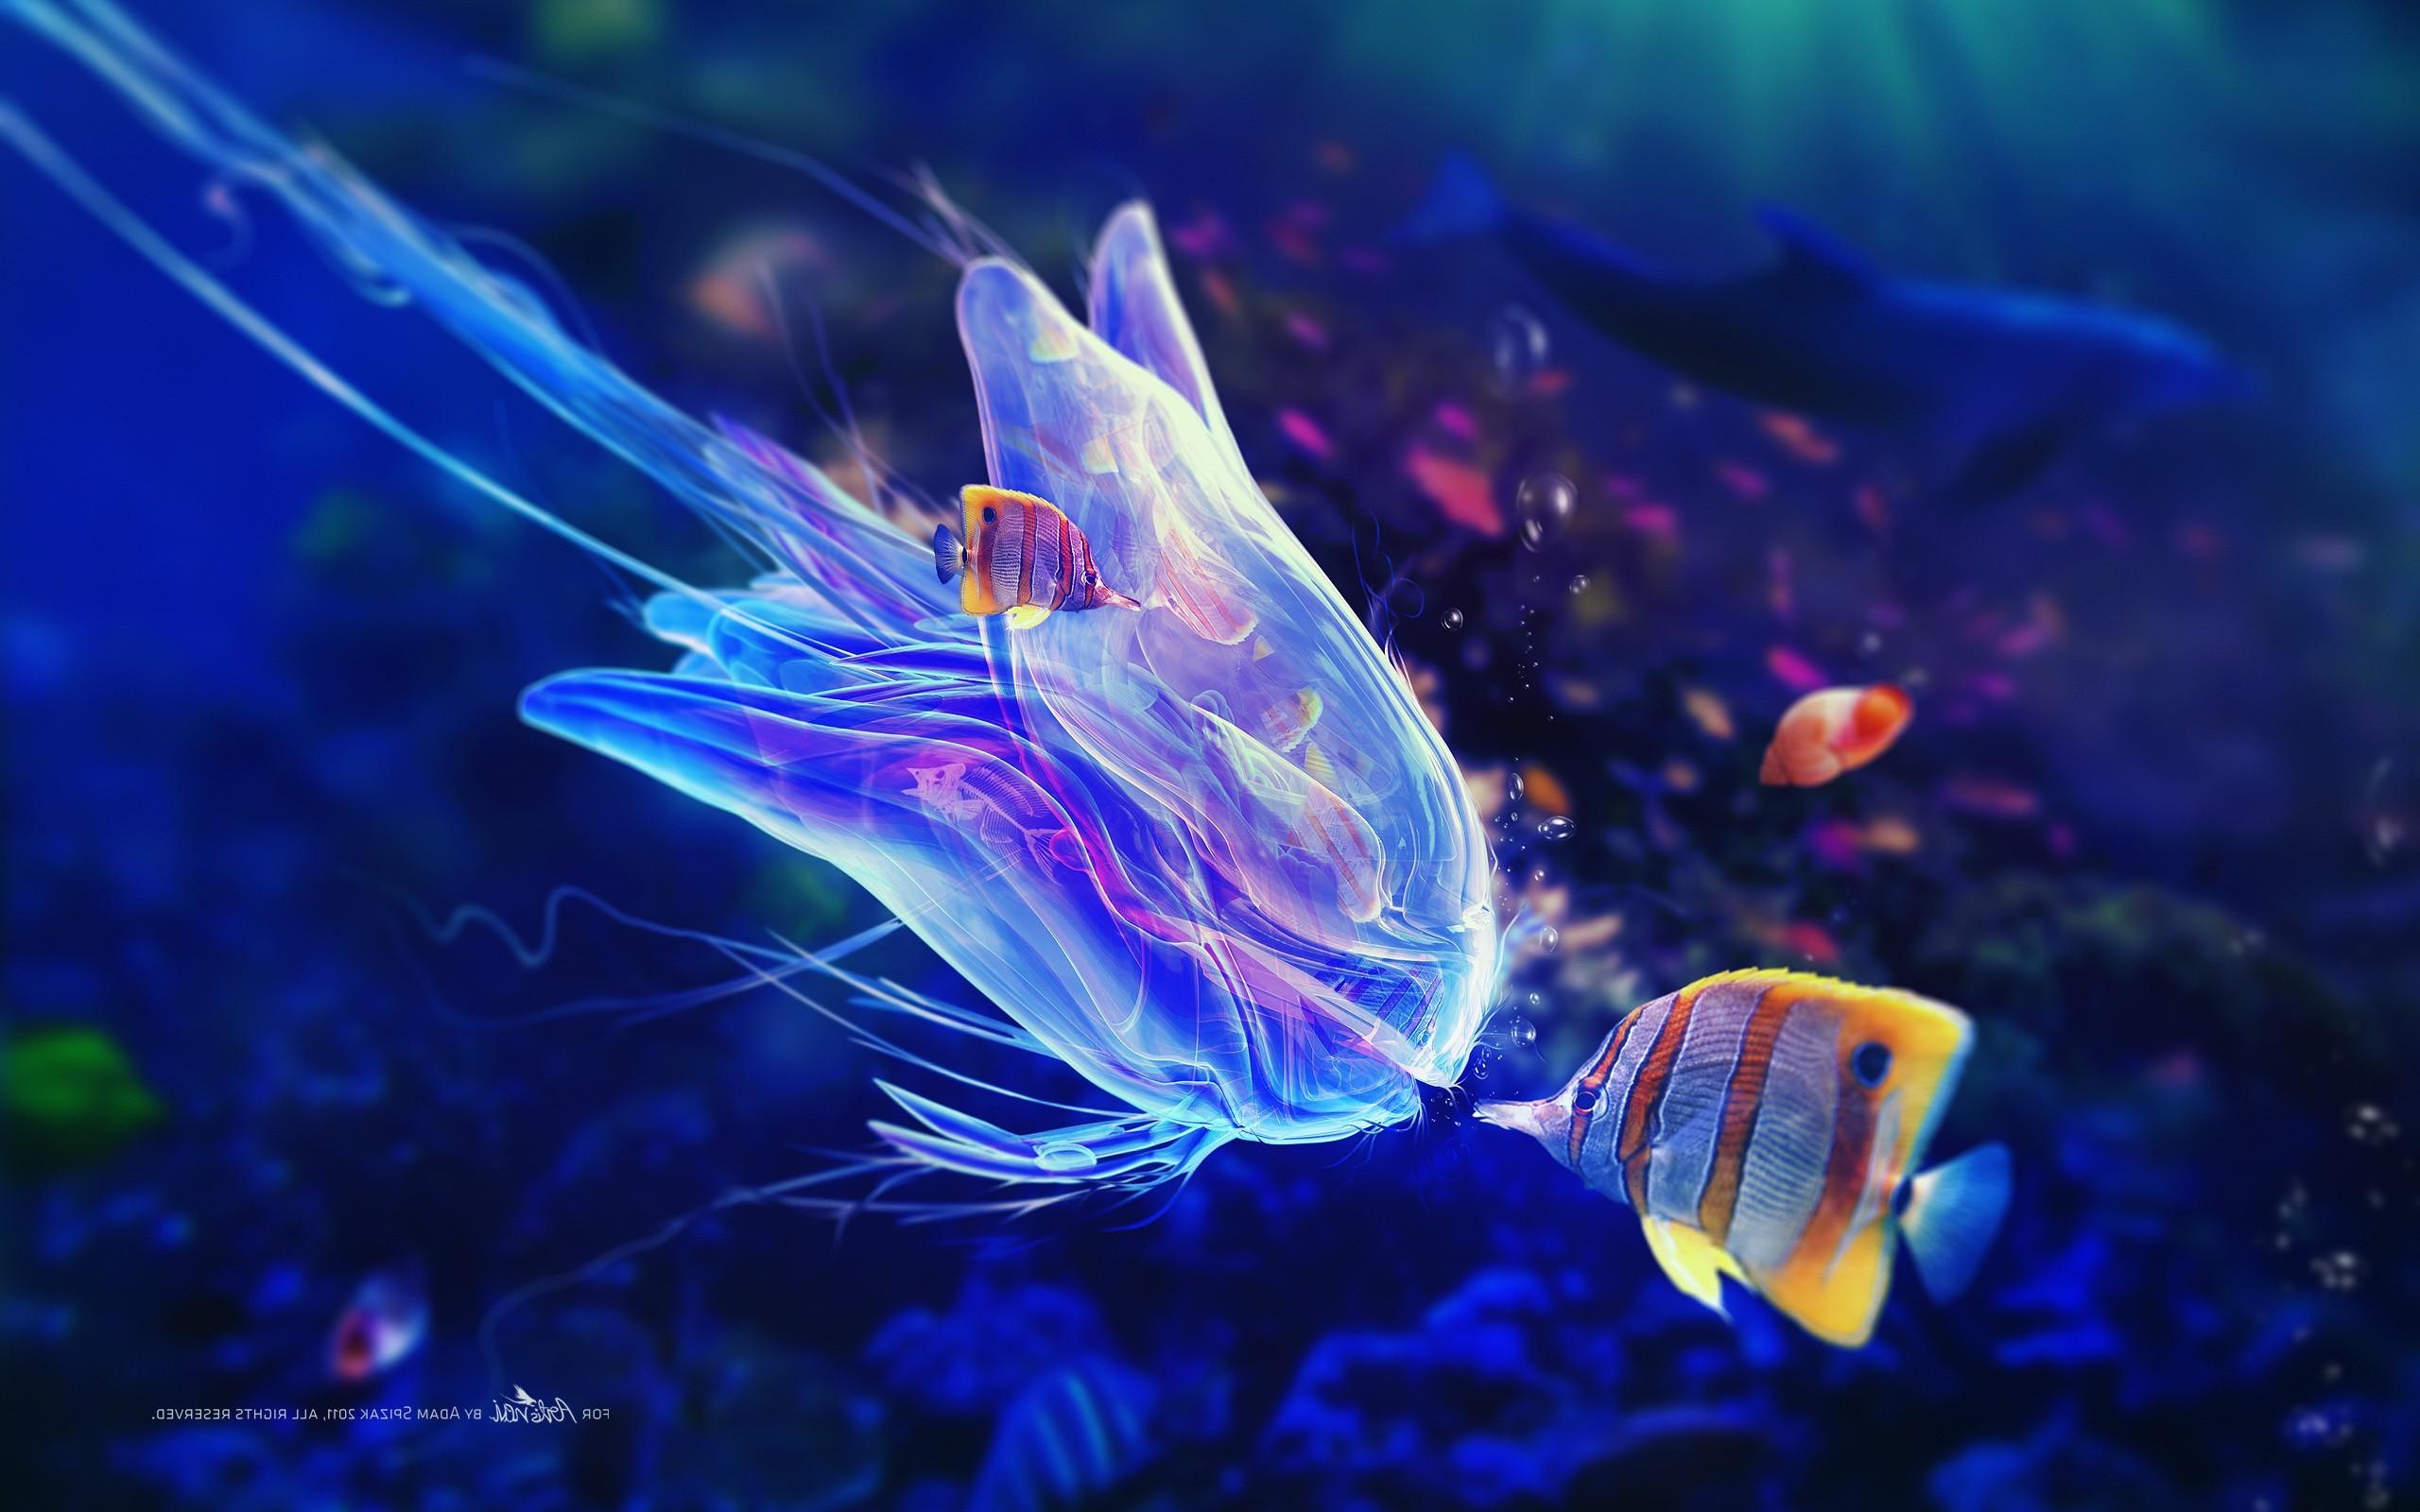 Fantasy Underwater Wallpaper Hd Wallpapers Ocean Life Hd